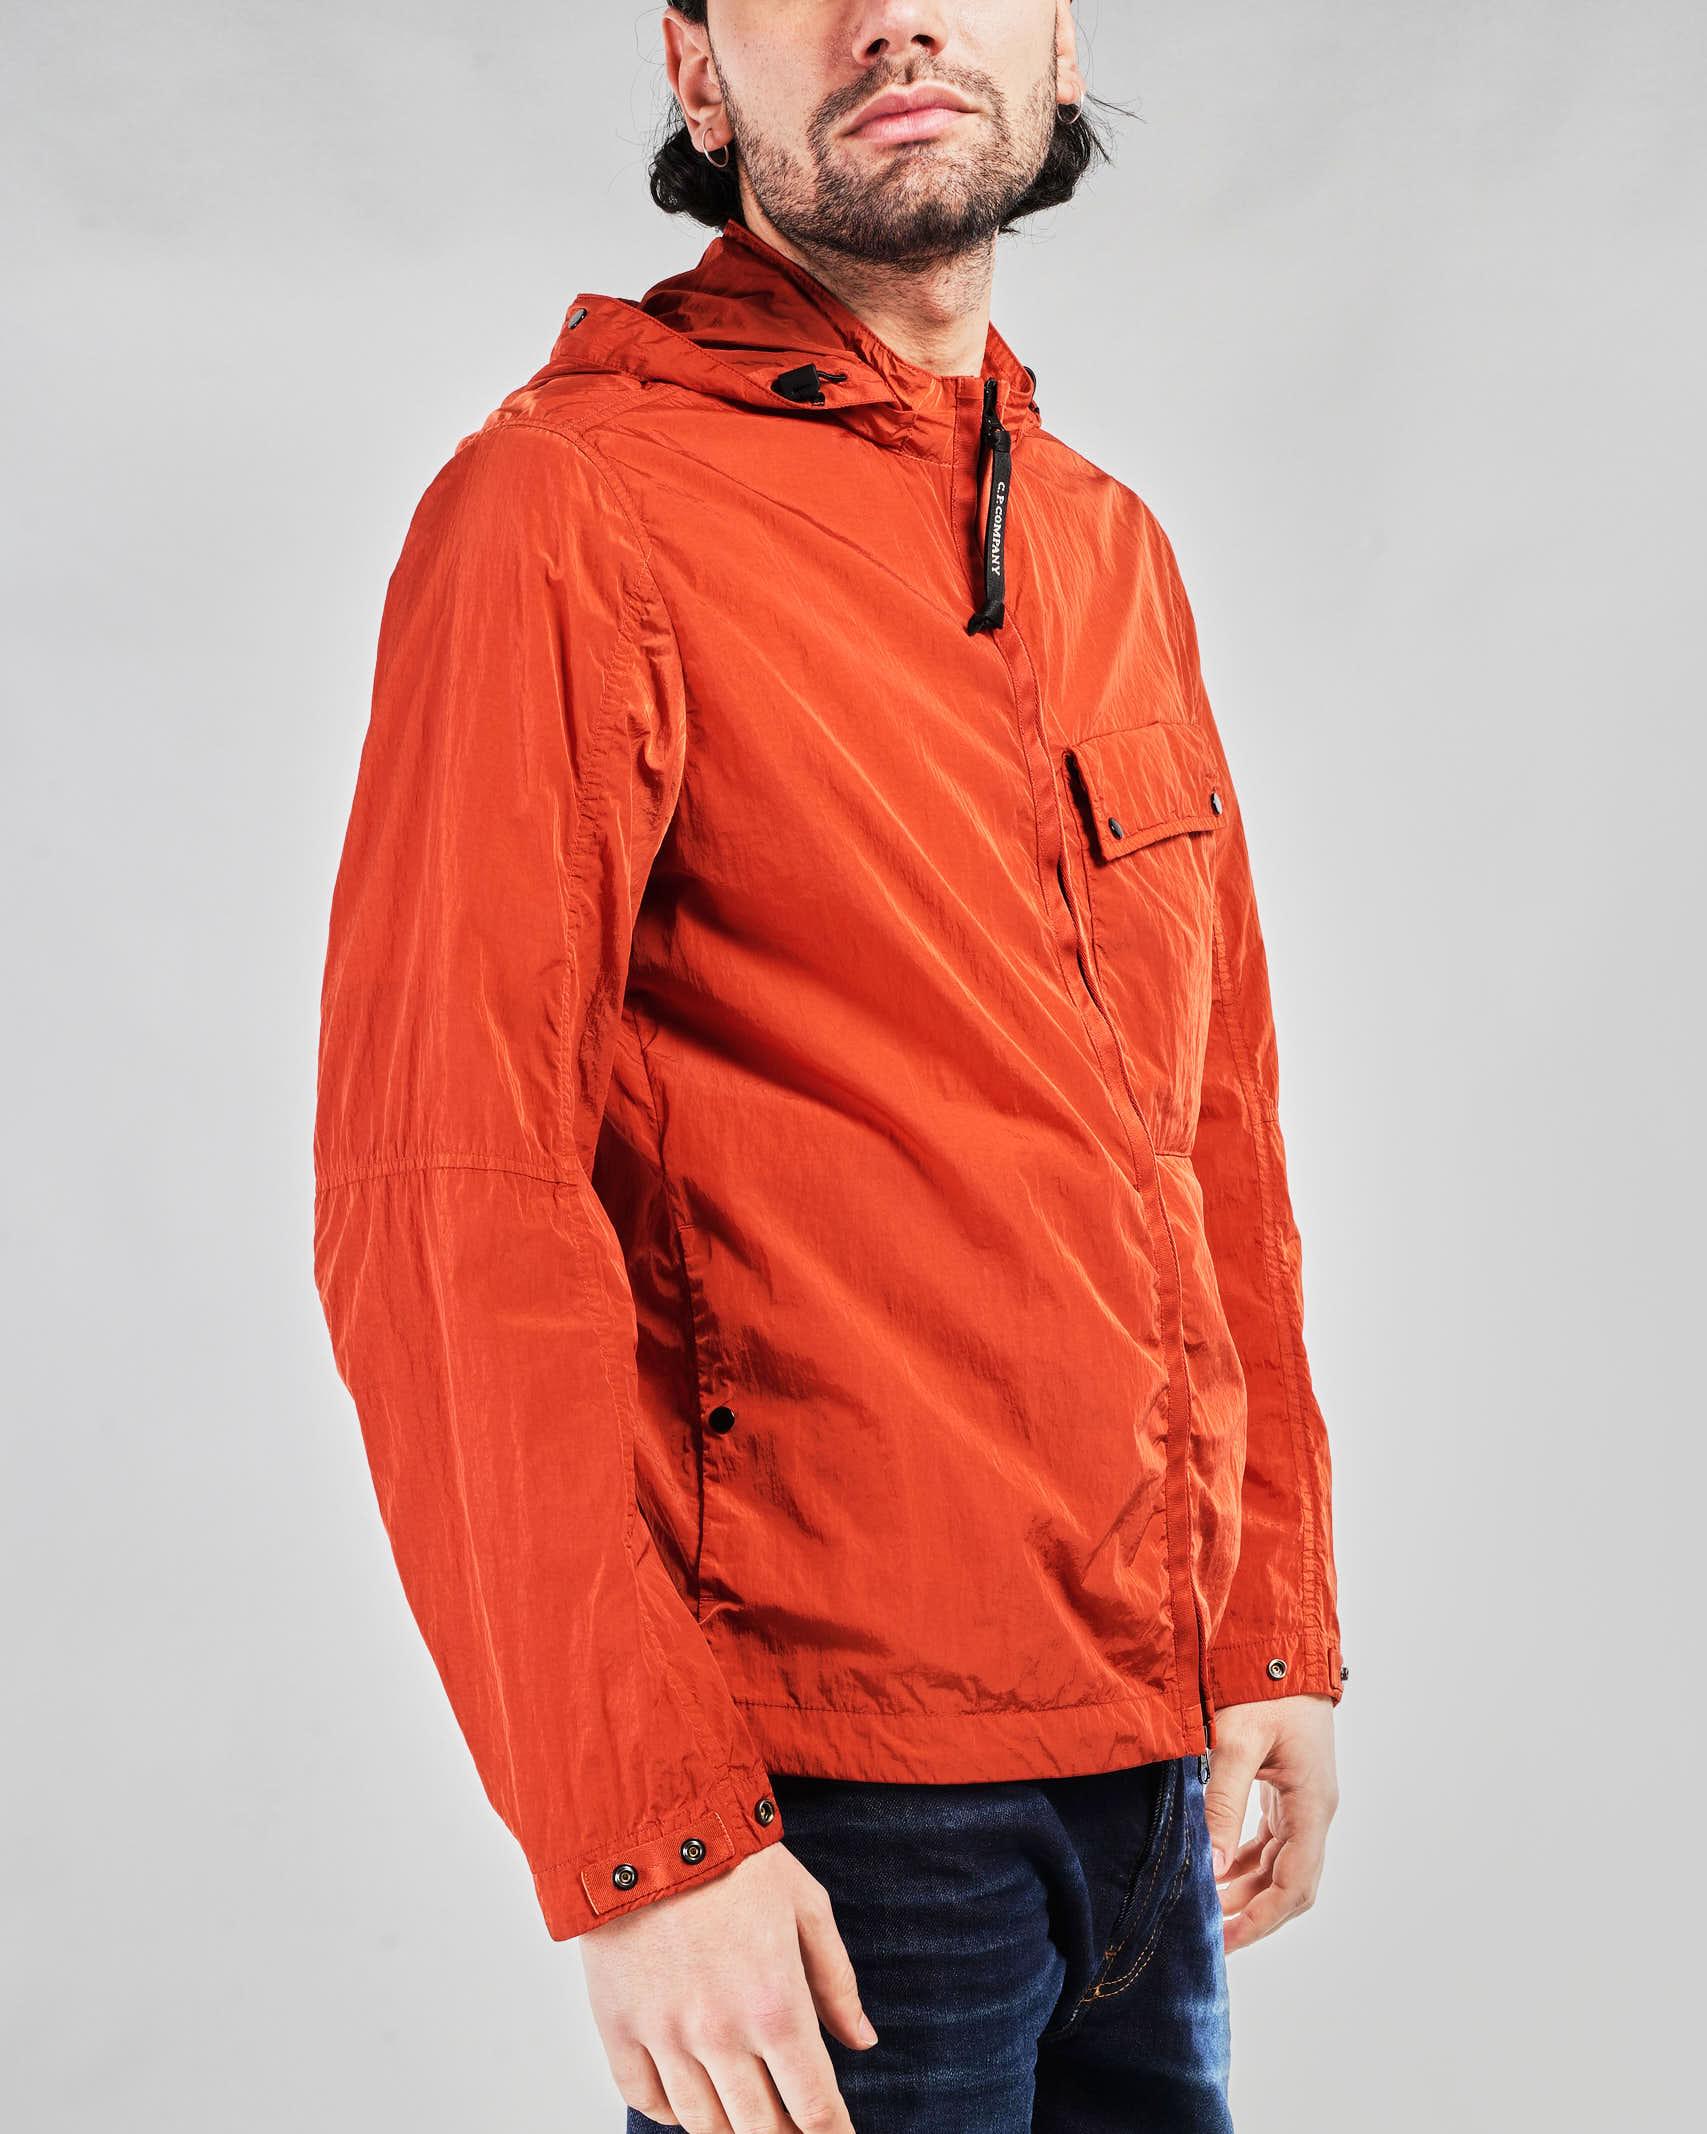 Giubbotto Chrome-R Mixed Garment Dyed Goggle Overshirt C.P. Company C.P. COMPANY | Giubbotto | 10CMOS026A005904M468